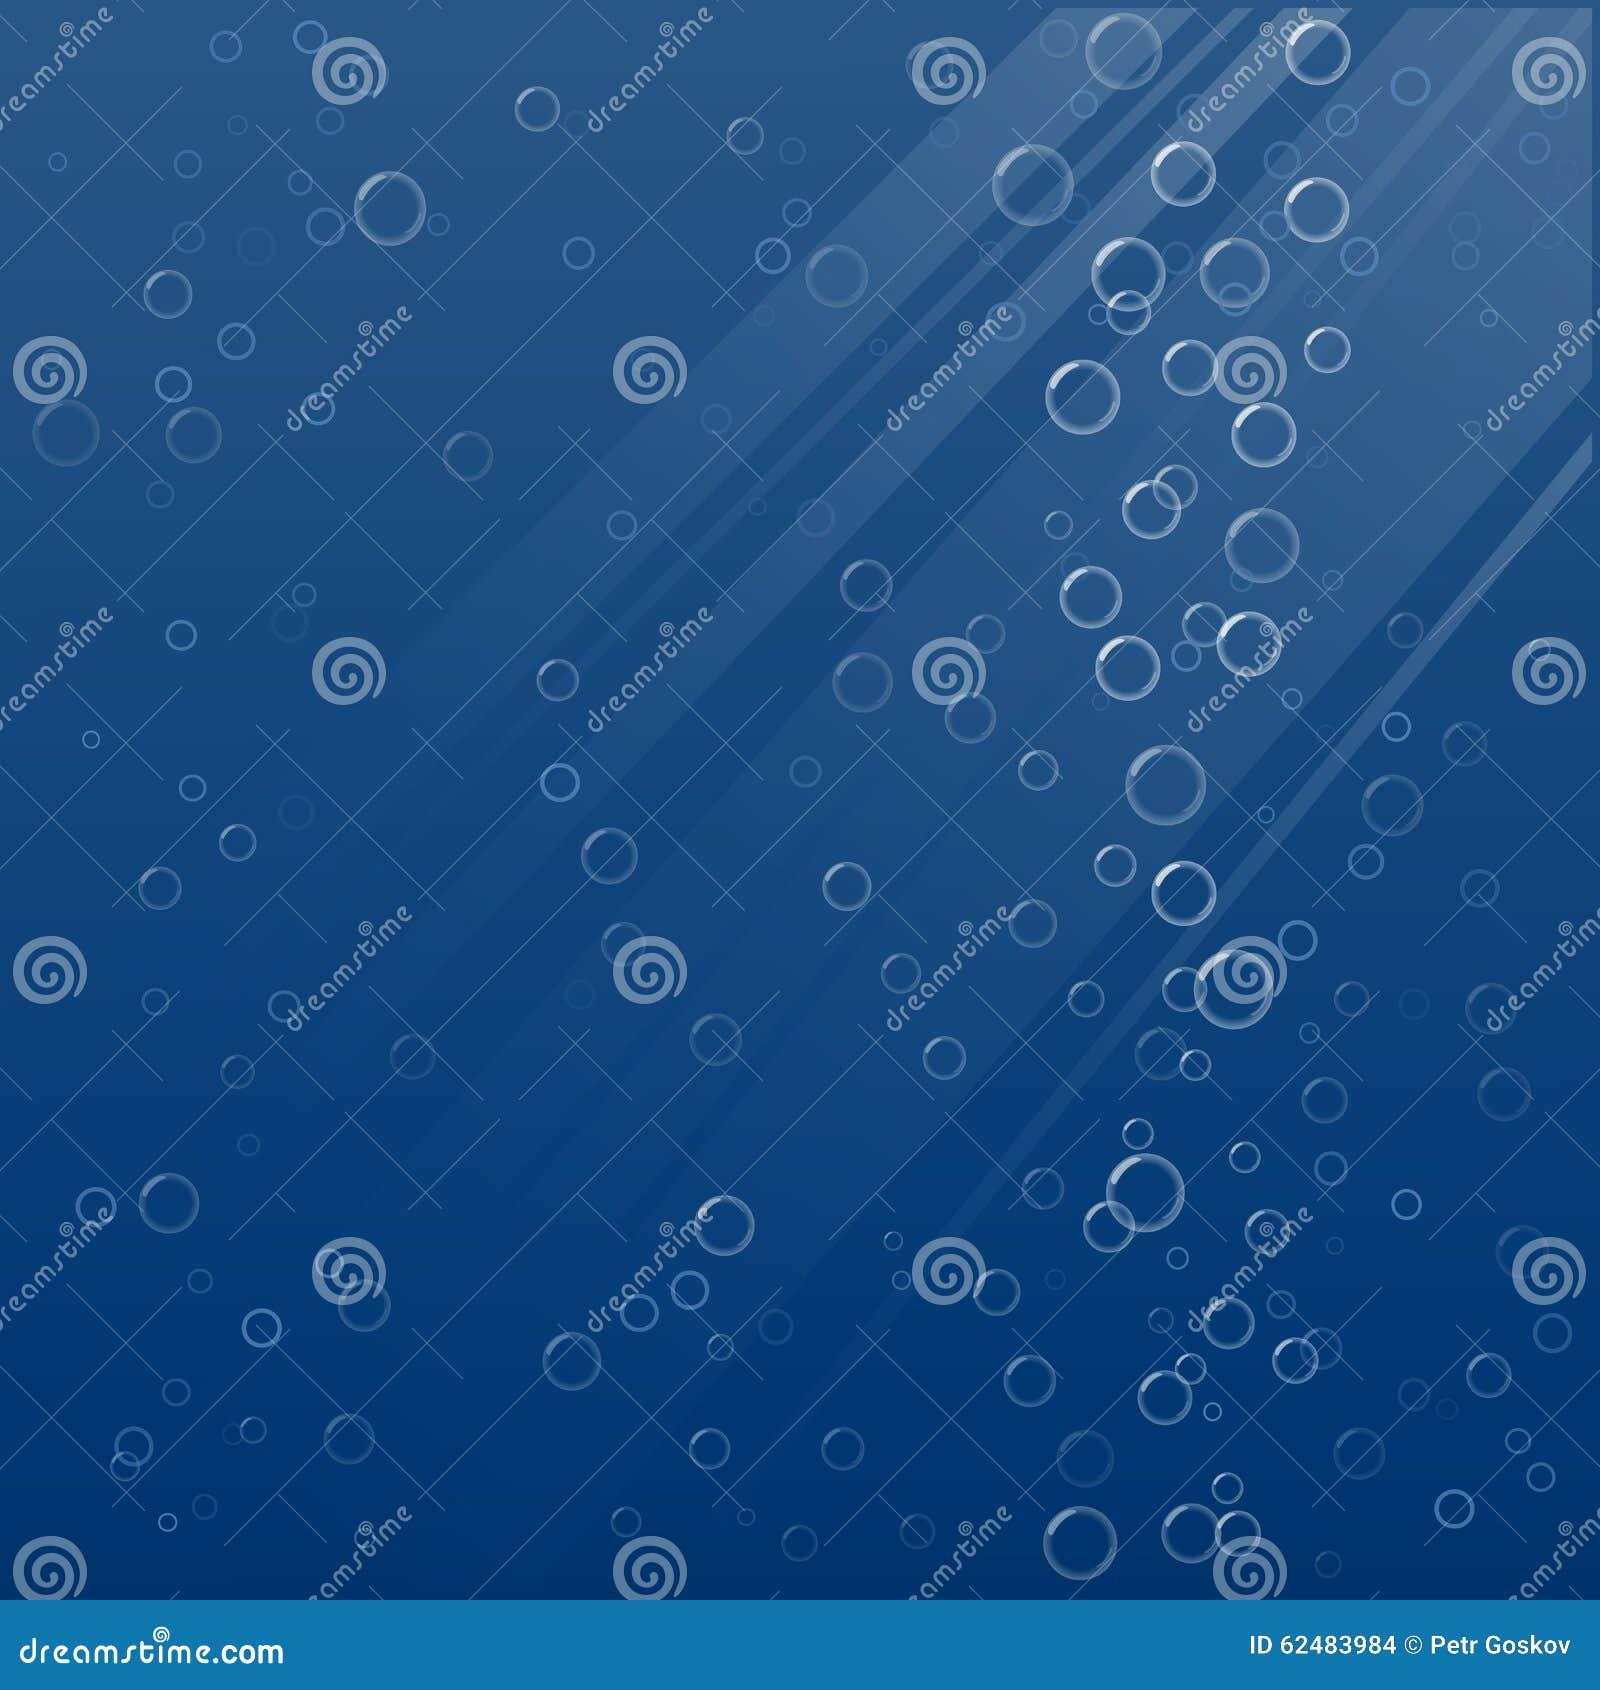 Bubbles Underwater. Vector Illustration. Stock Vector ...